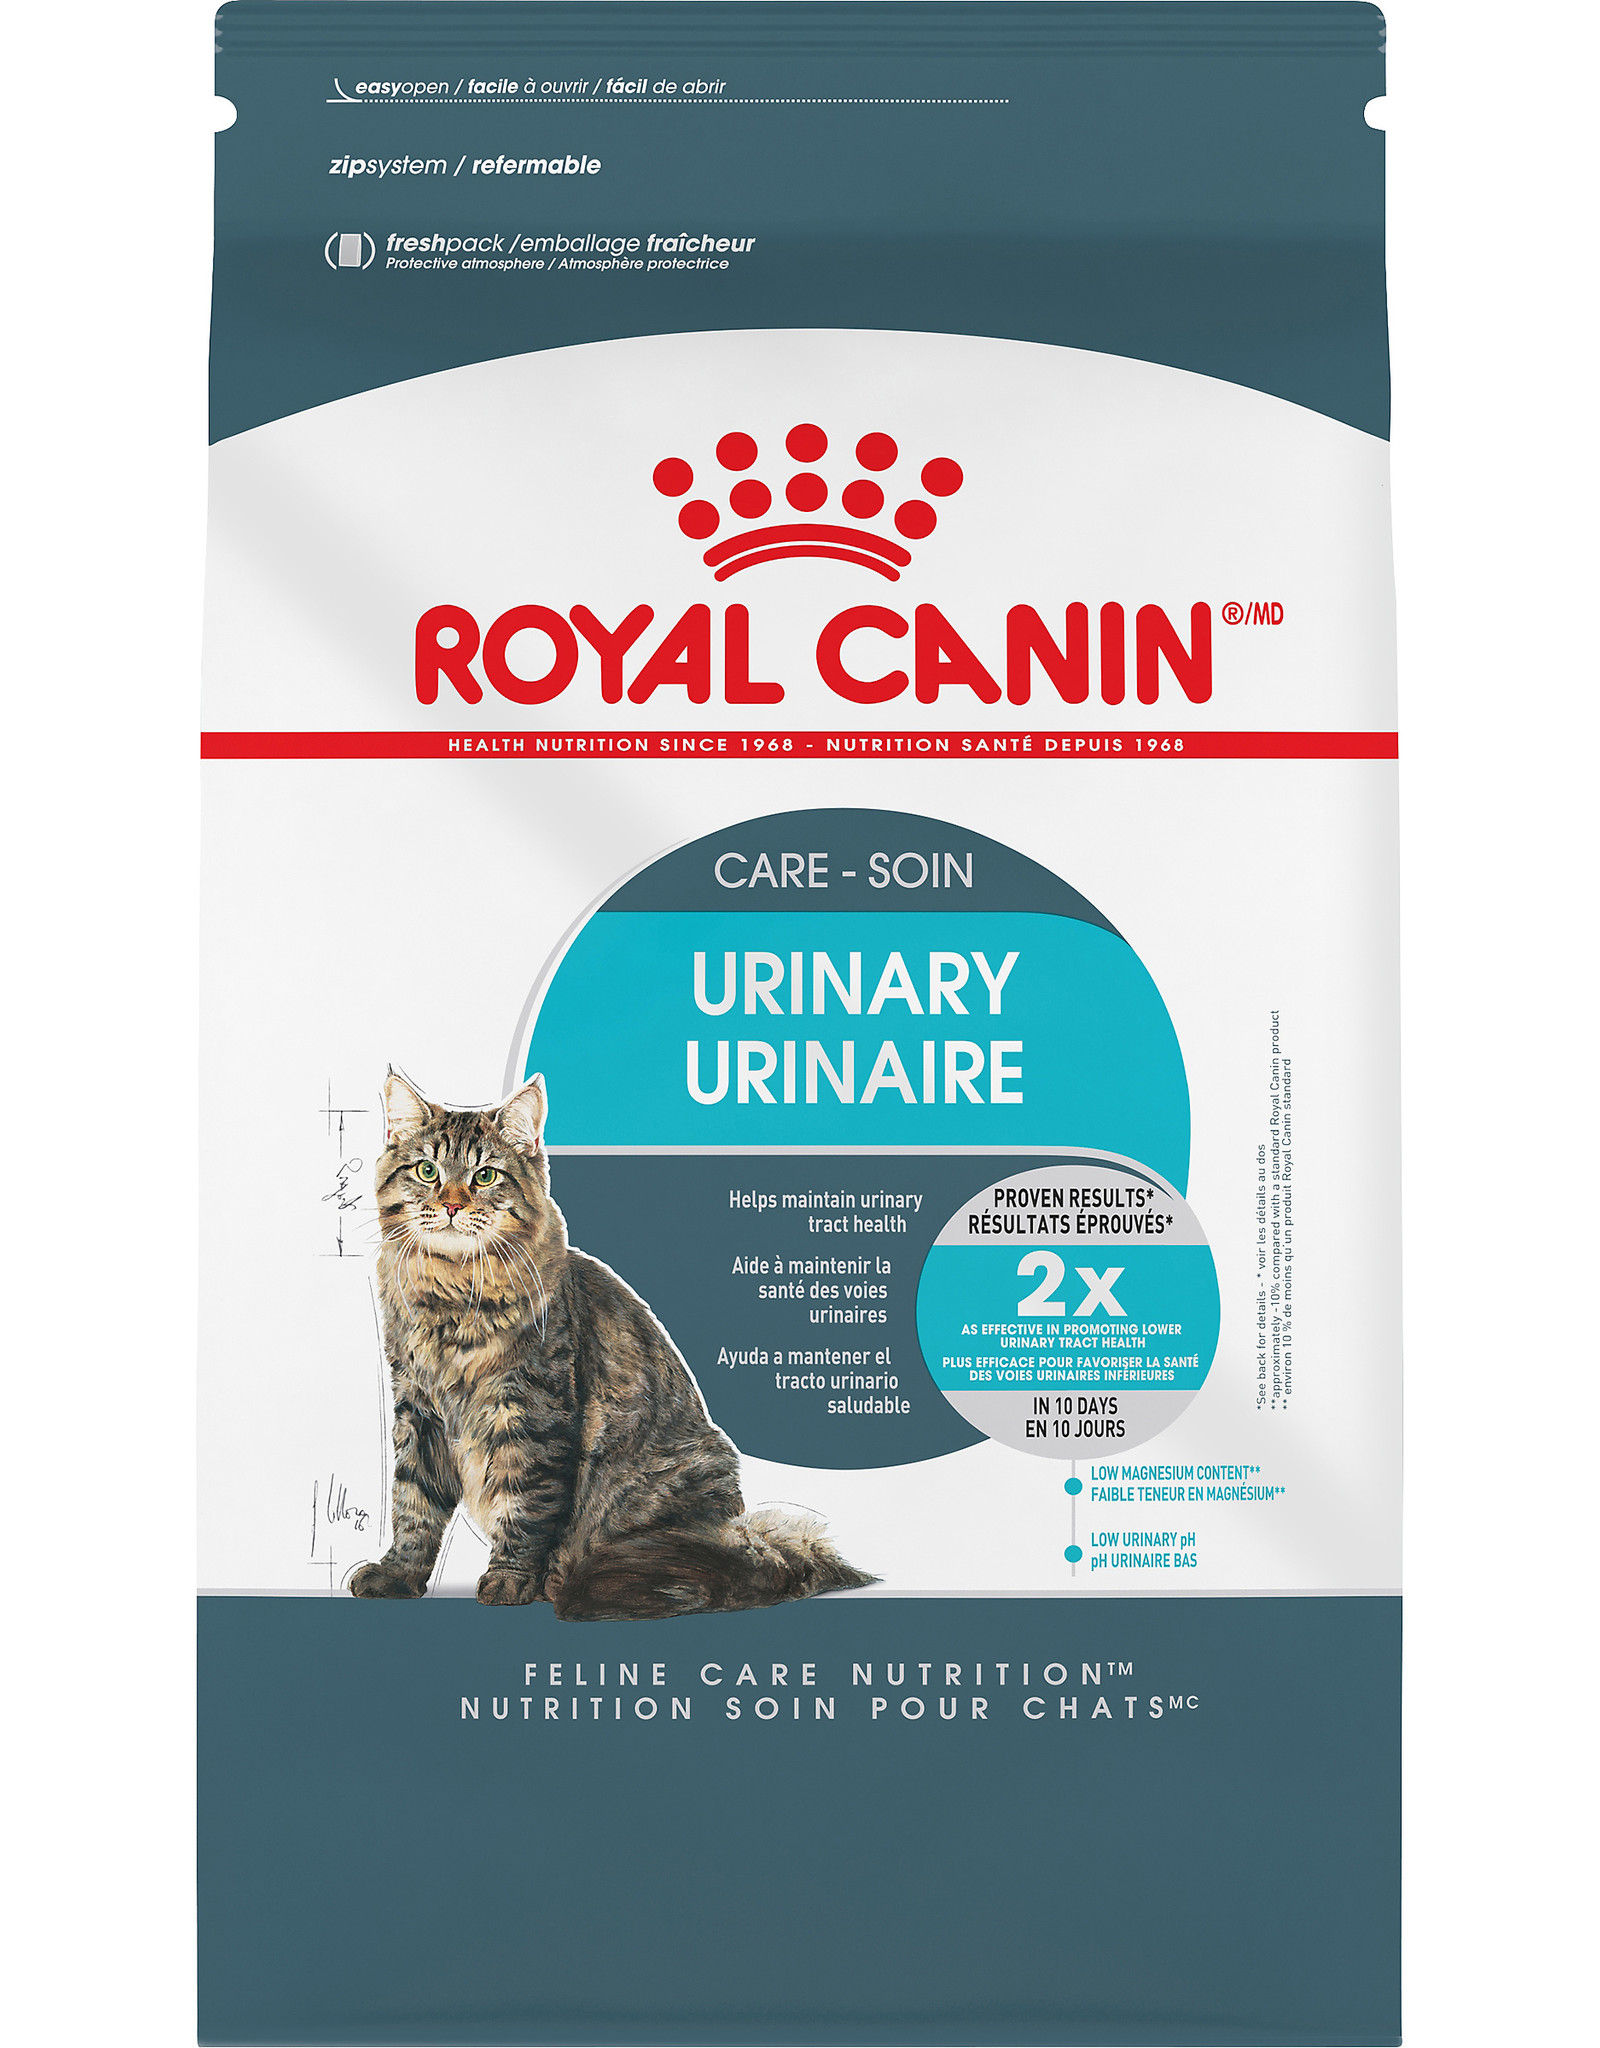 Royal Canin Royal Canin Cat Urinary Care 3lb